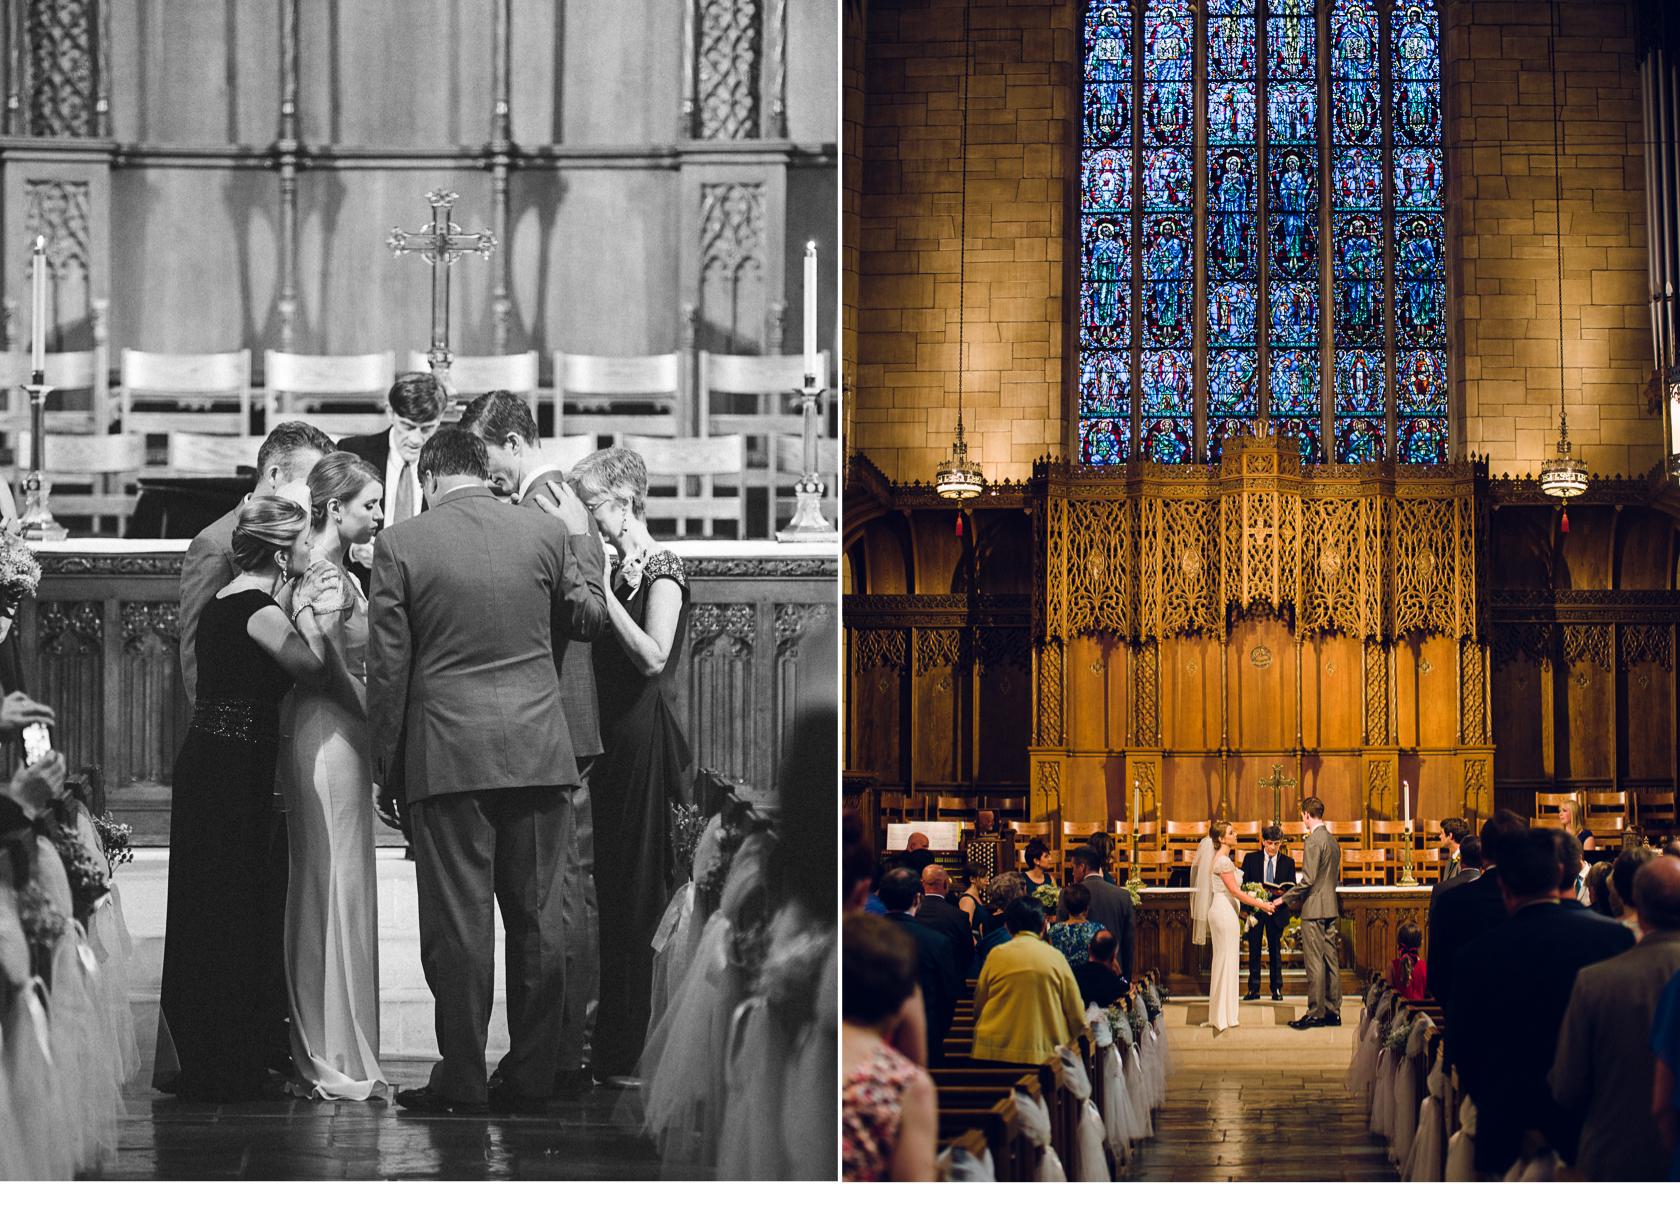 Prayer of Bride and Groom